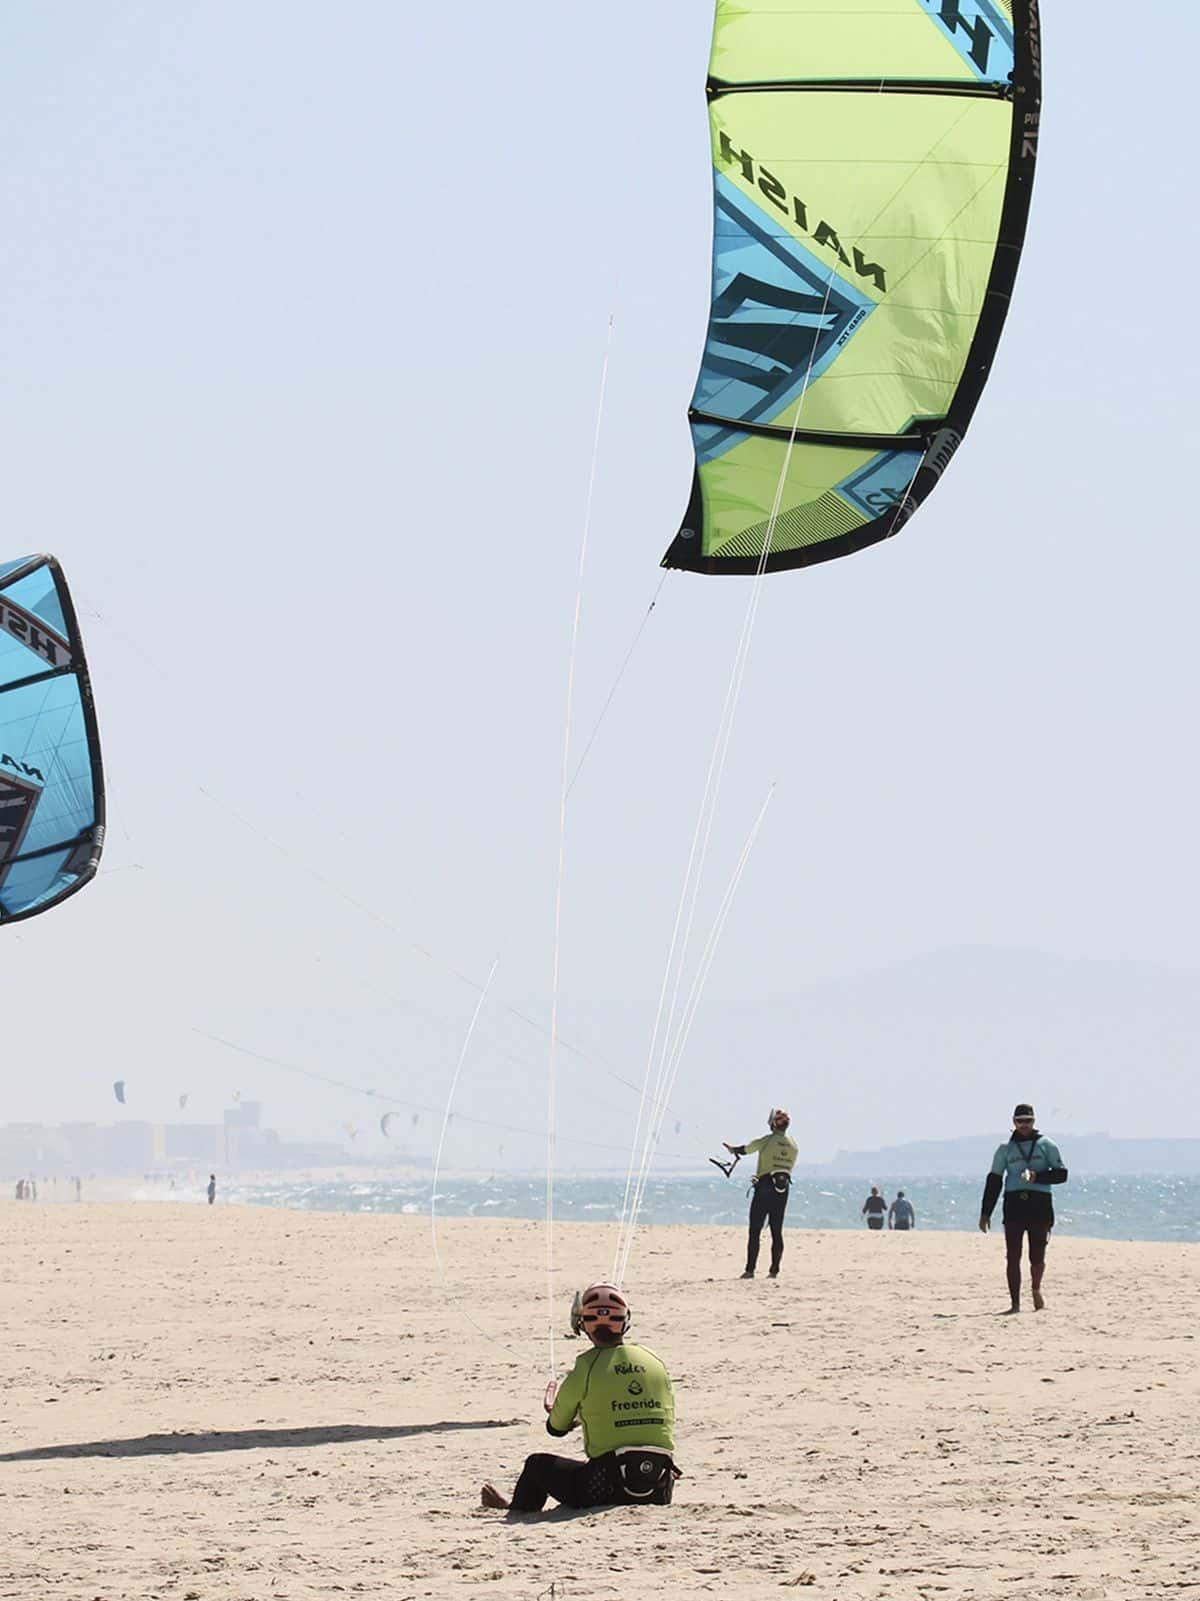 Cours semi-privé, un kite chacun